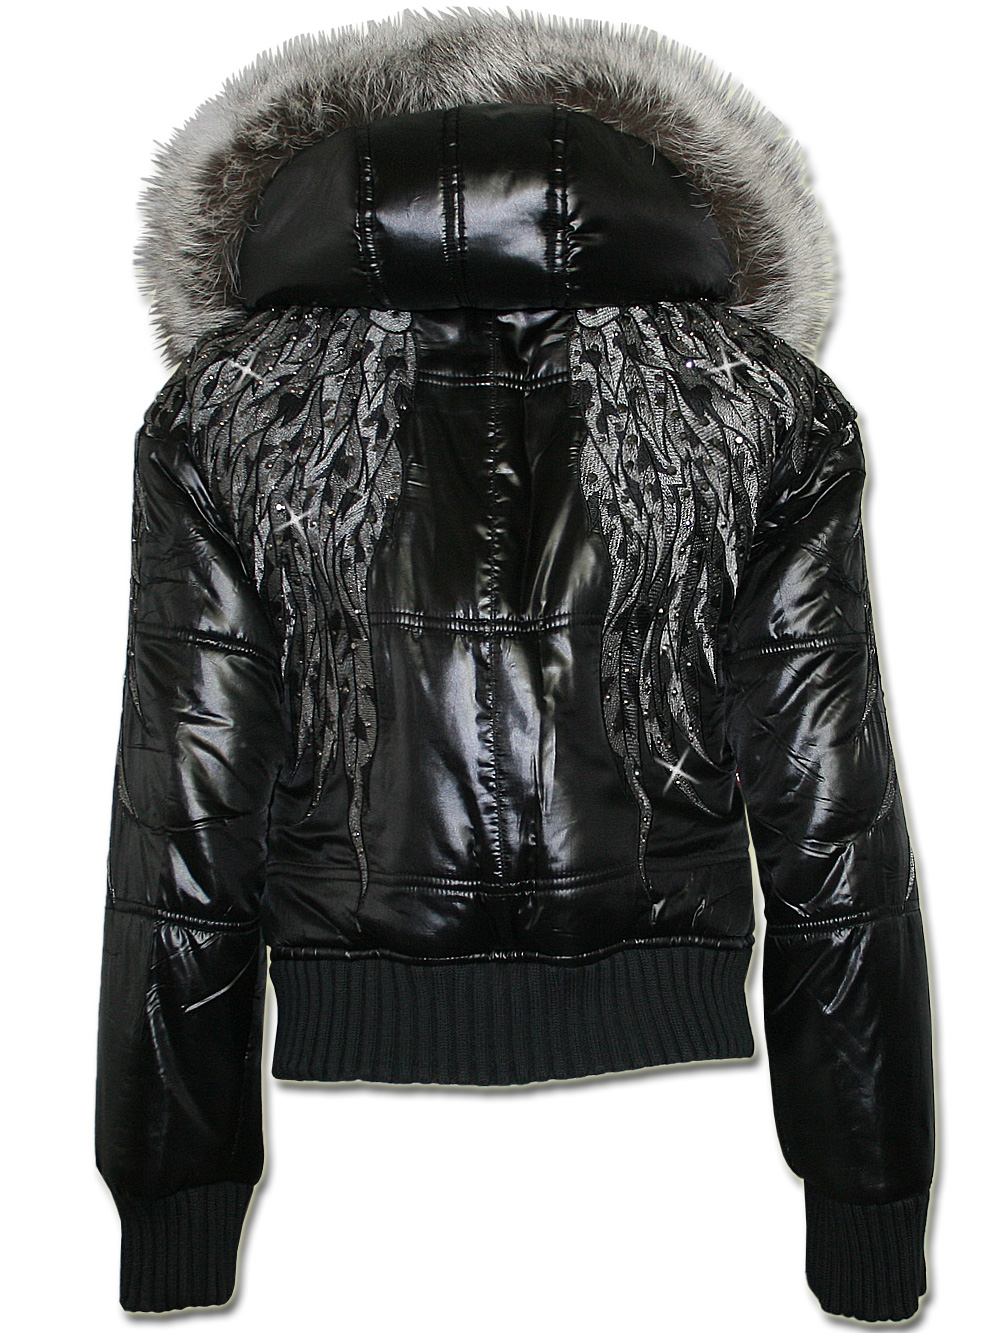 philipp plein damen strass dauenjacke in schwarz wings neu ebay. Black Bedroom Furniture Sets. Home Design Ideas